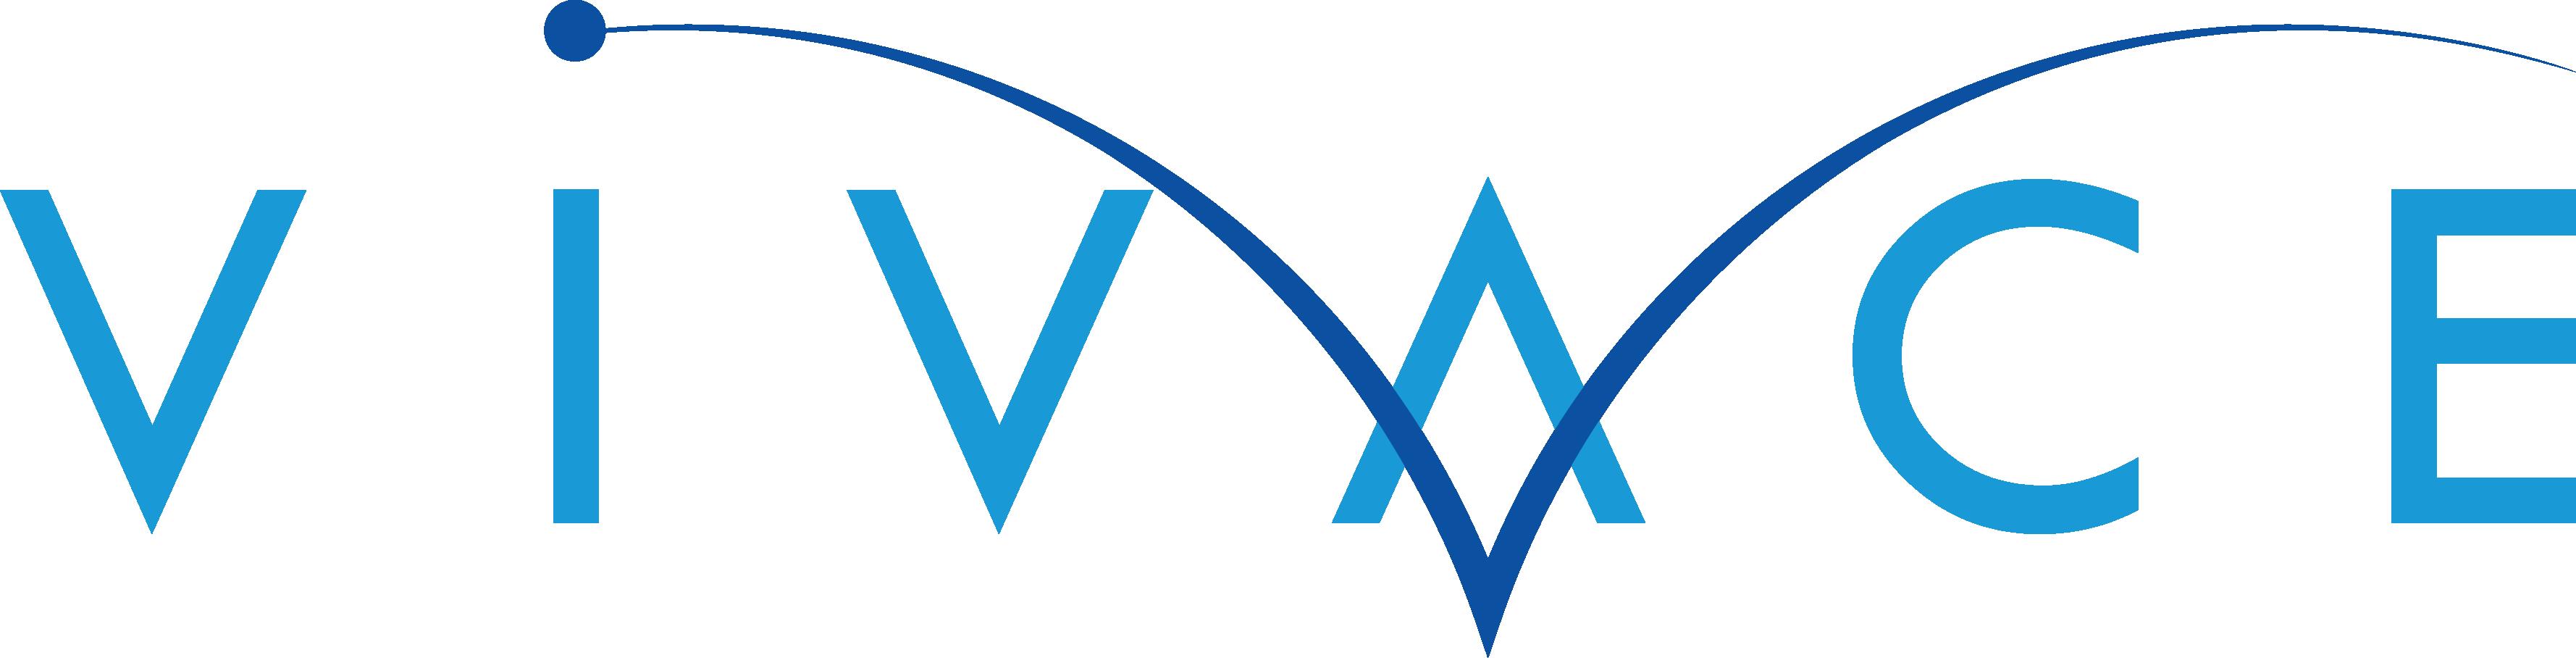 Vivace logo Virtual Christmas art tour review